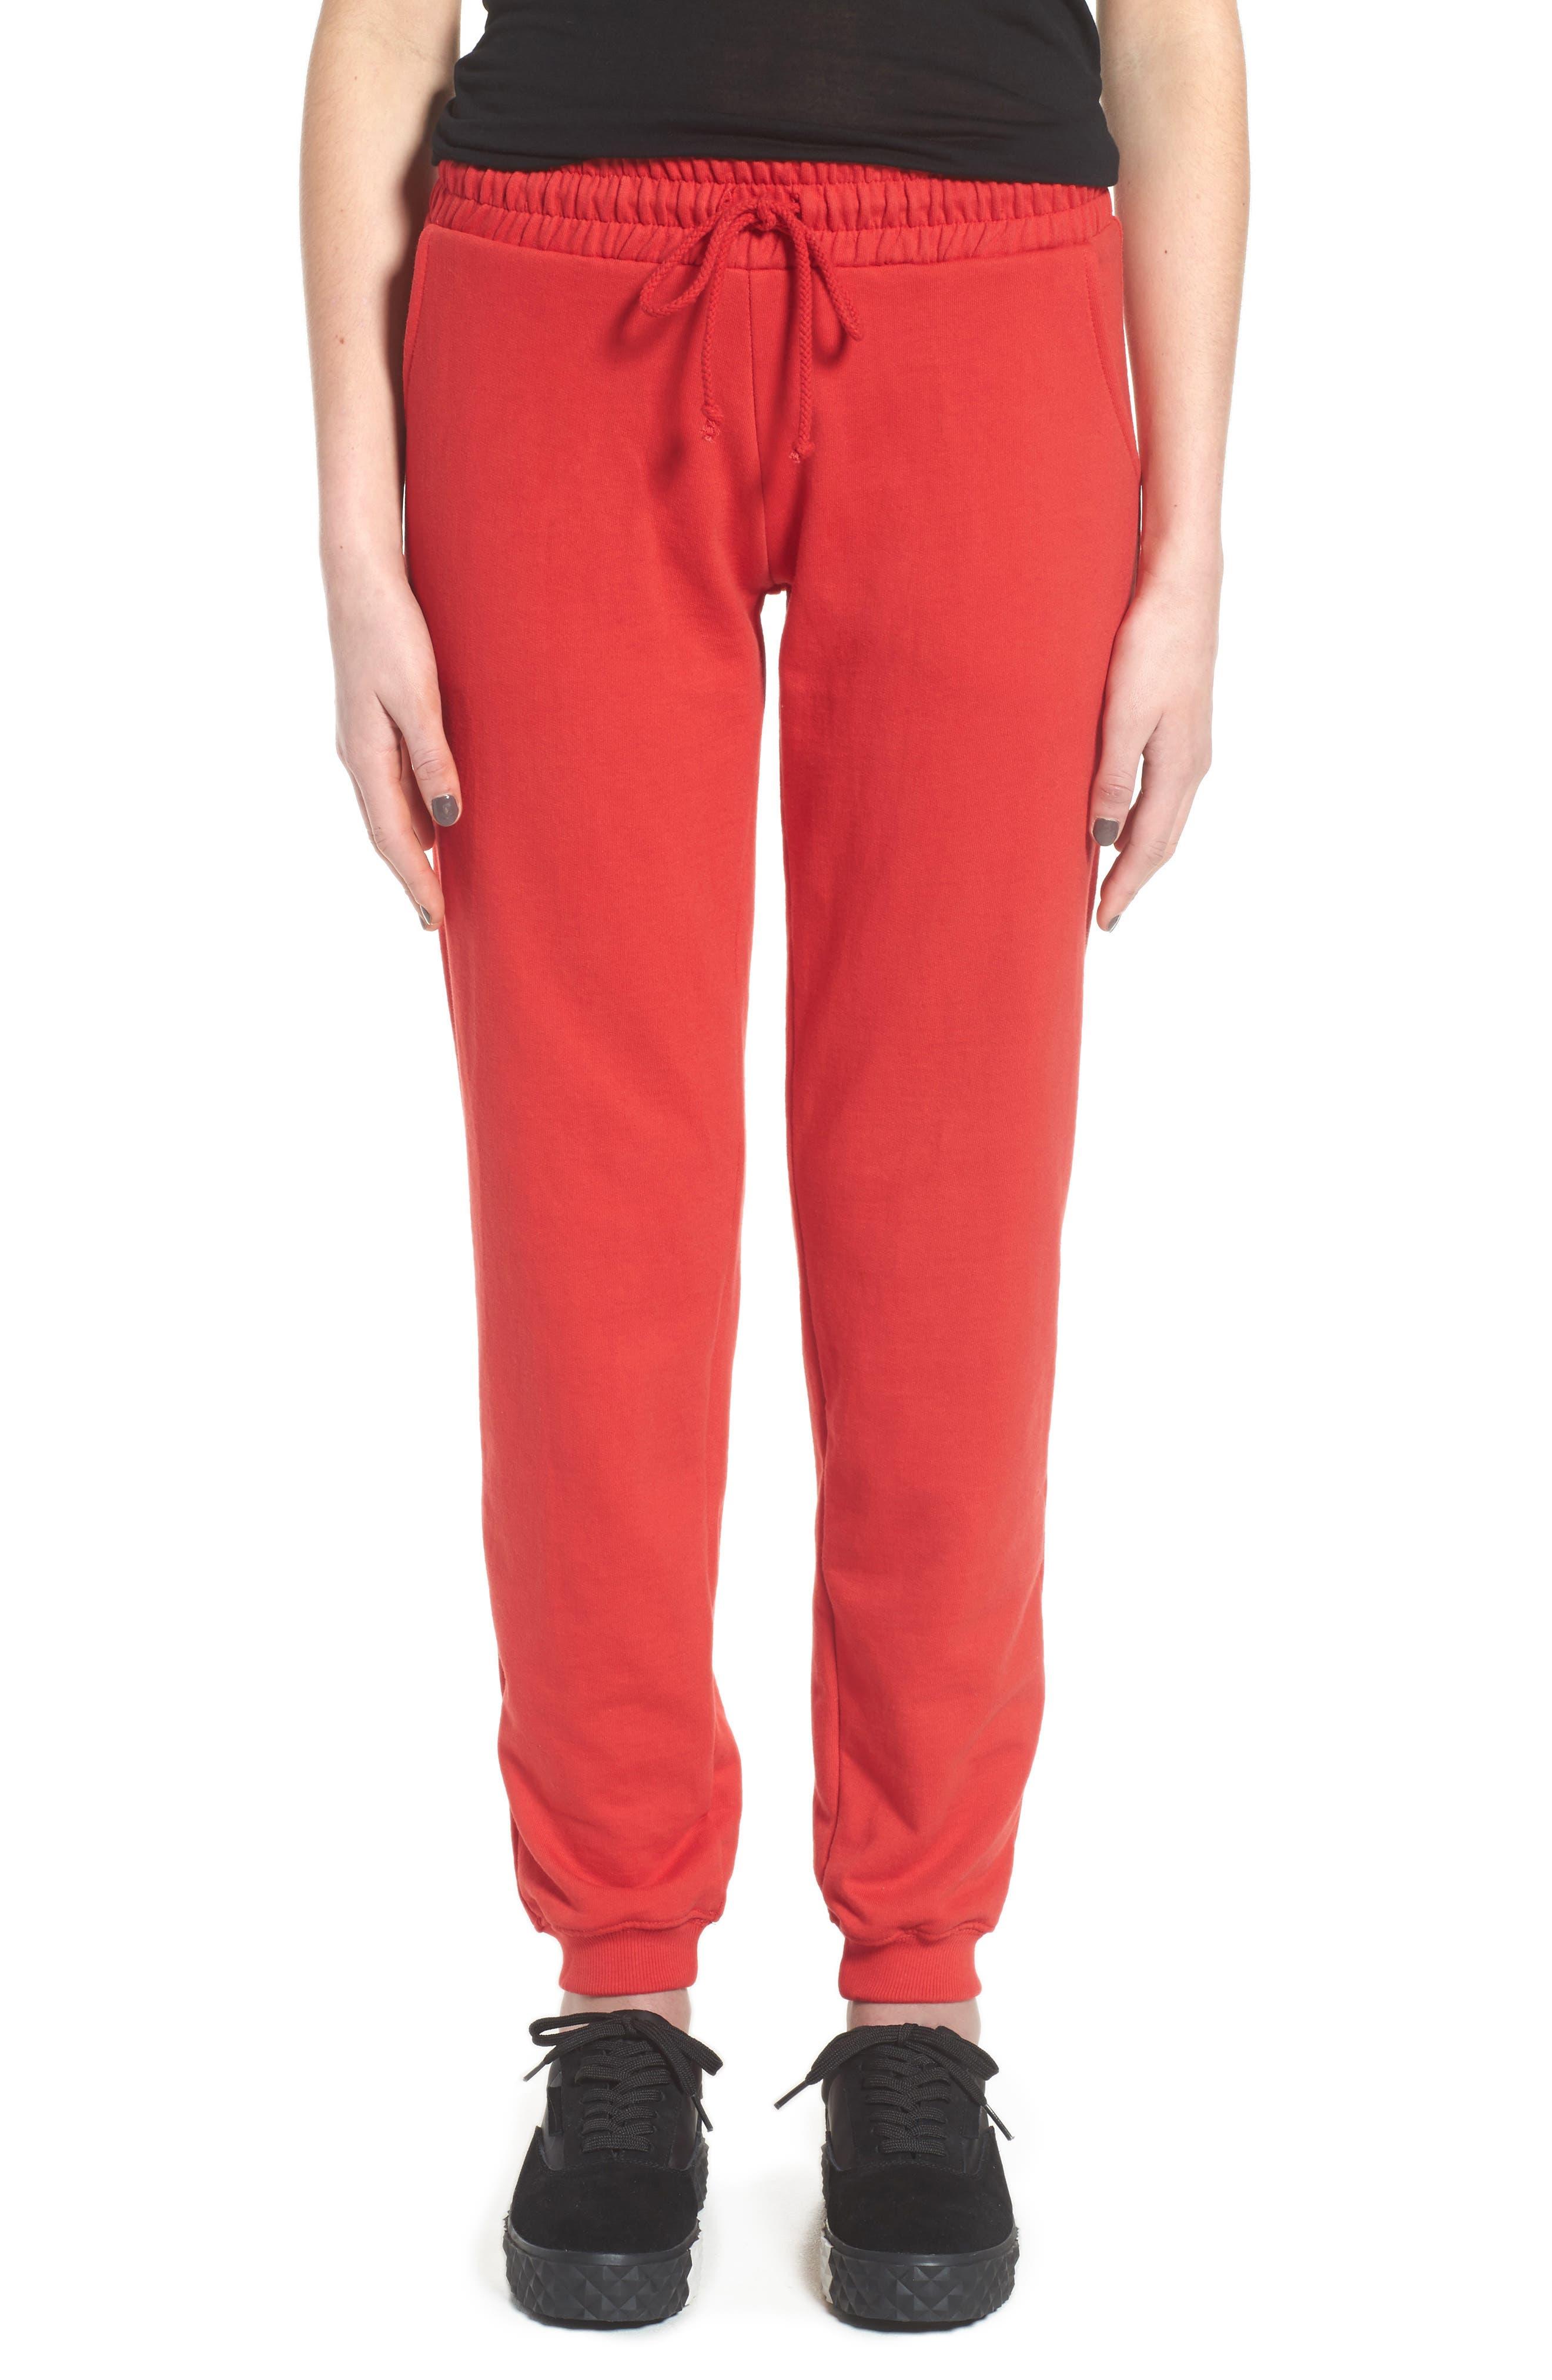 ME. Rose Sweatpants,                             Alternate thumbnail 2, color,                             CHERRY RED